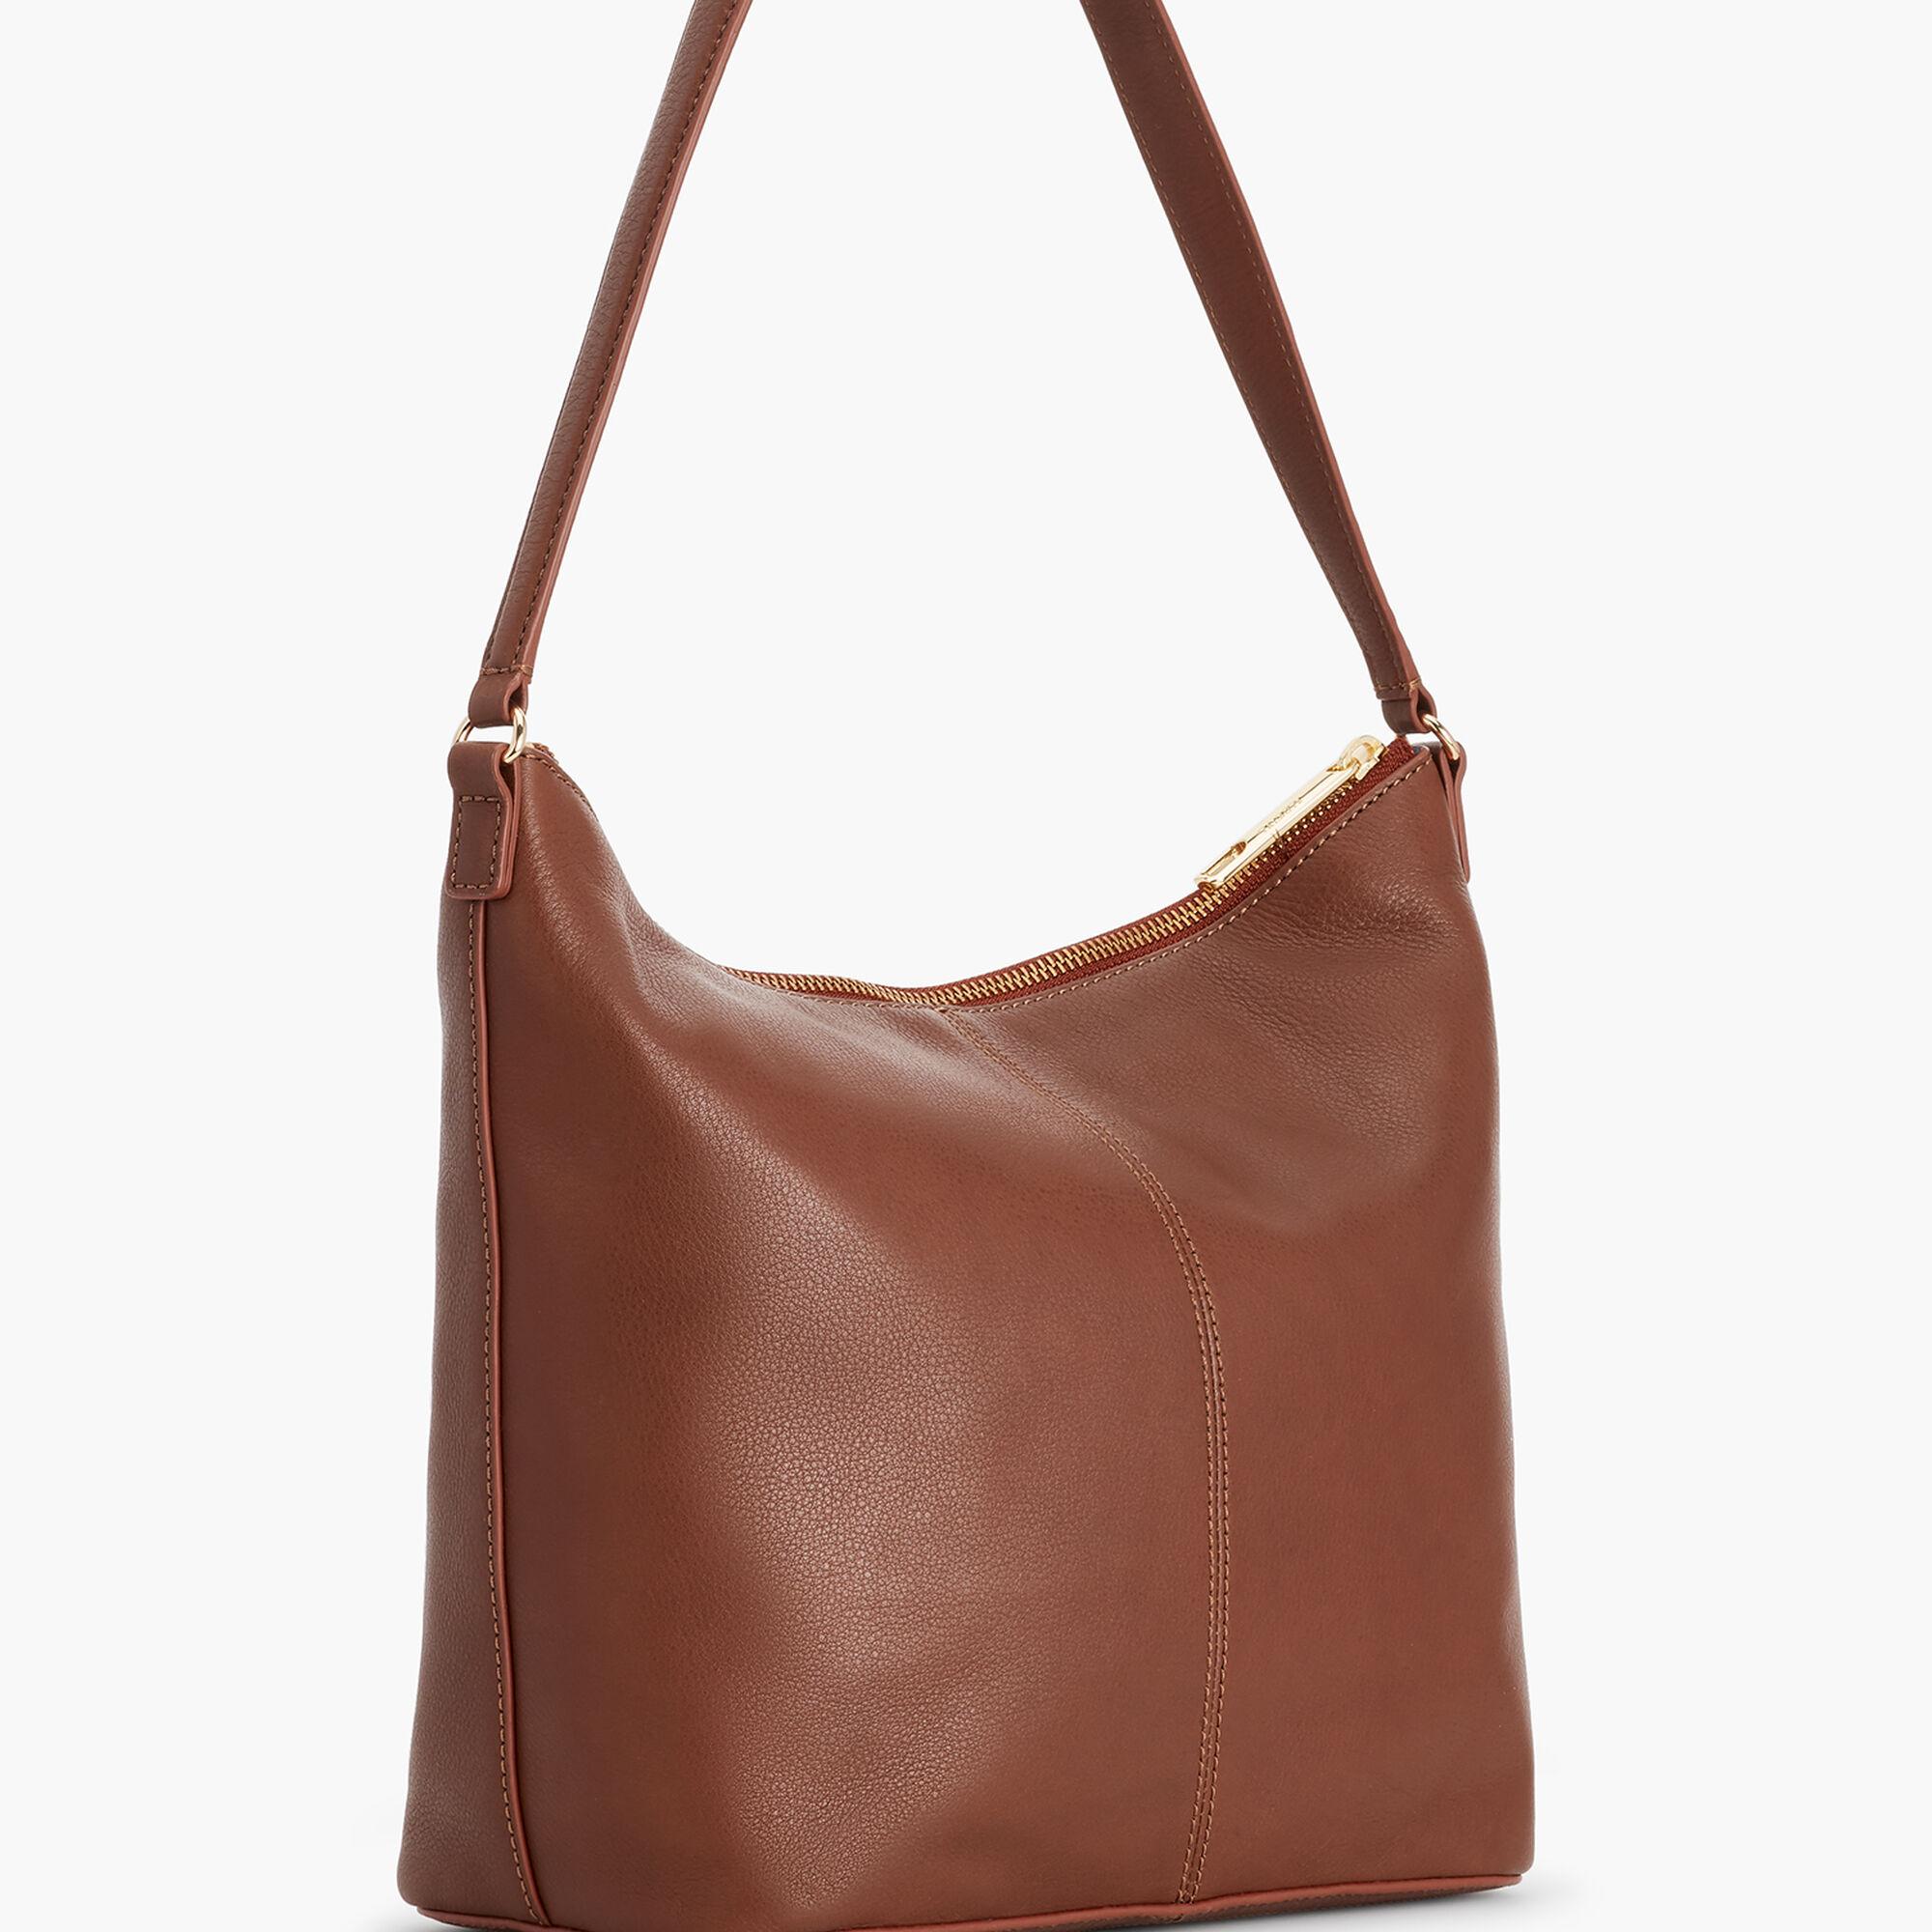 941ded4bfbef Soft Leather Hobo Handbags - Foto Handbag All Collections ...